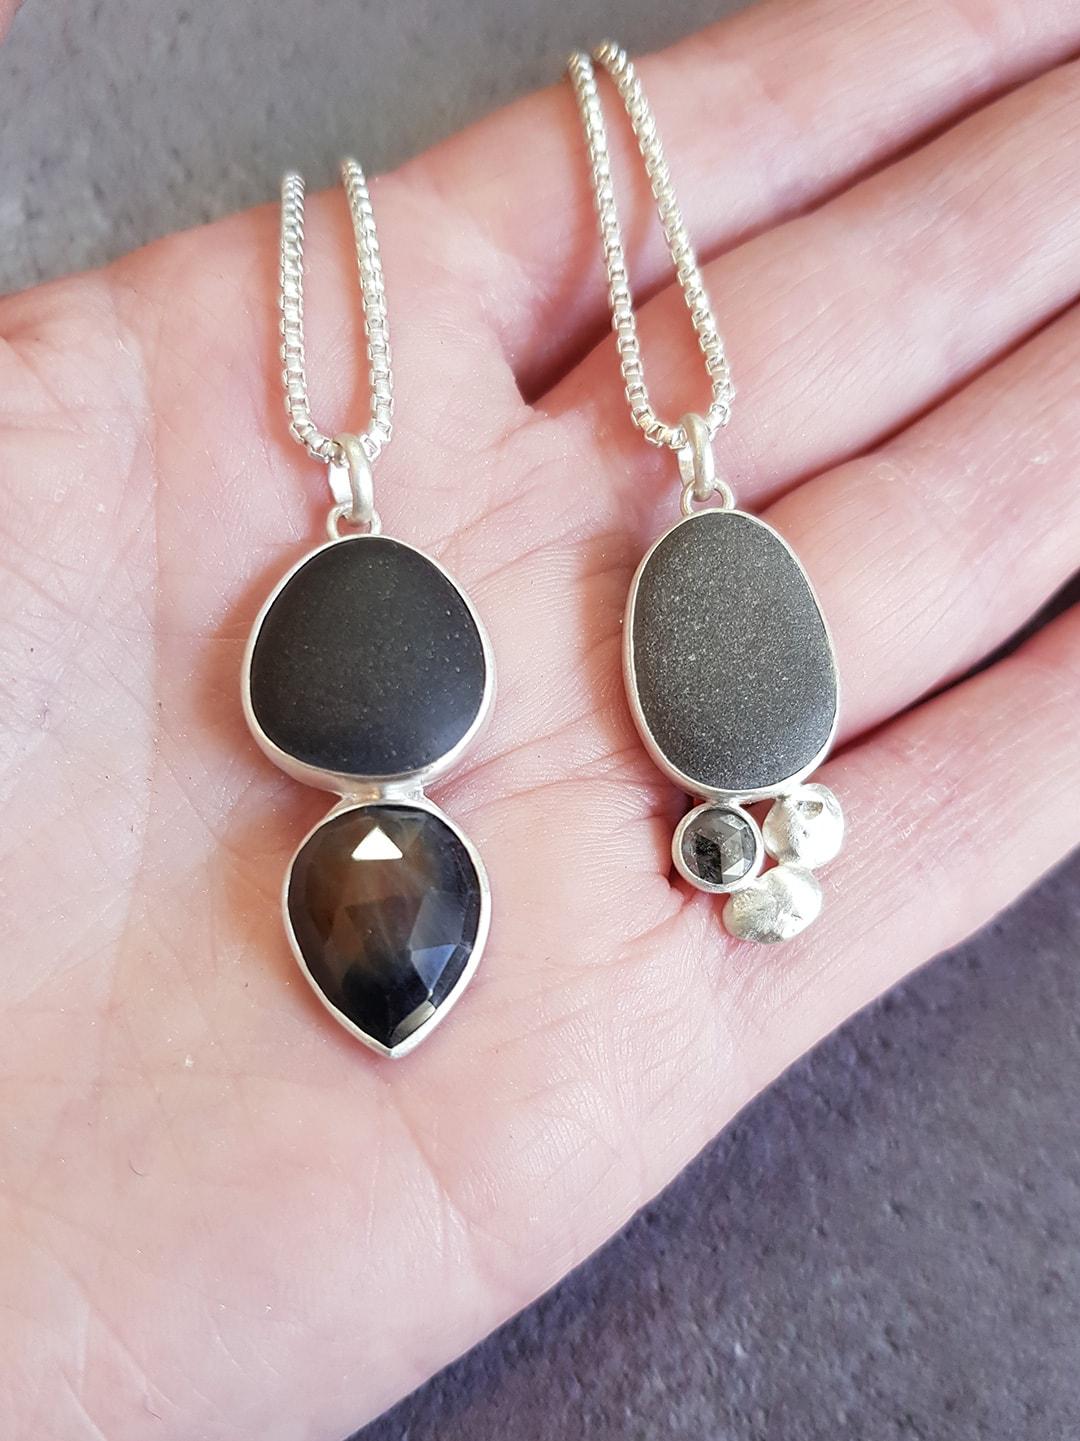 Pebble pendants with diamond and sapphire